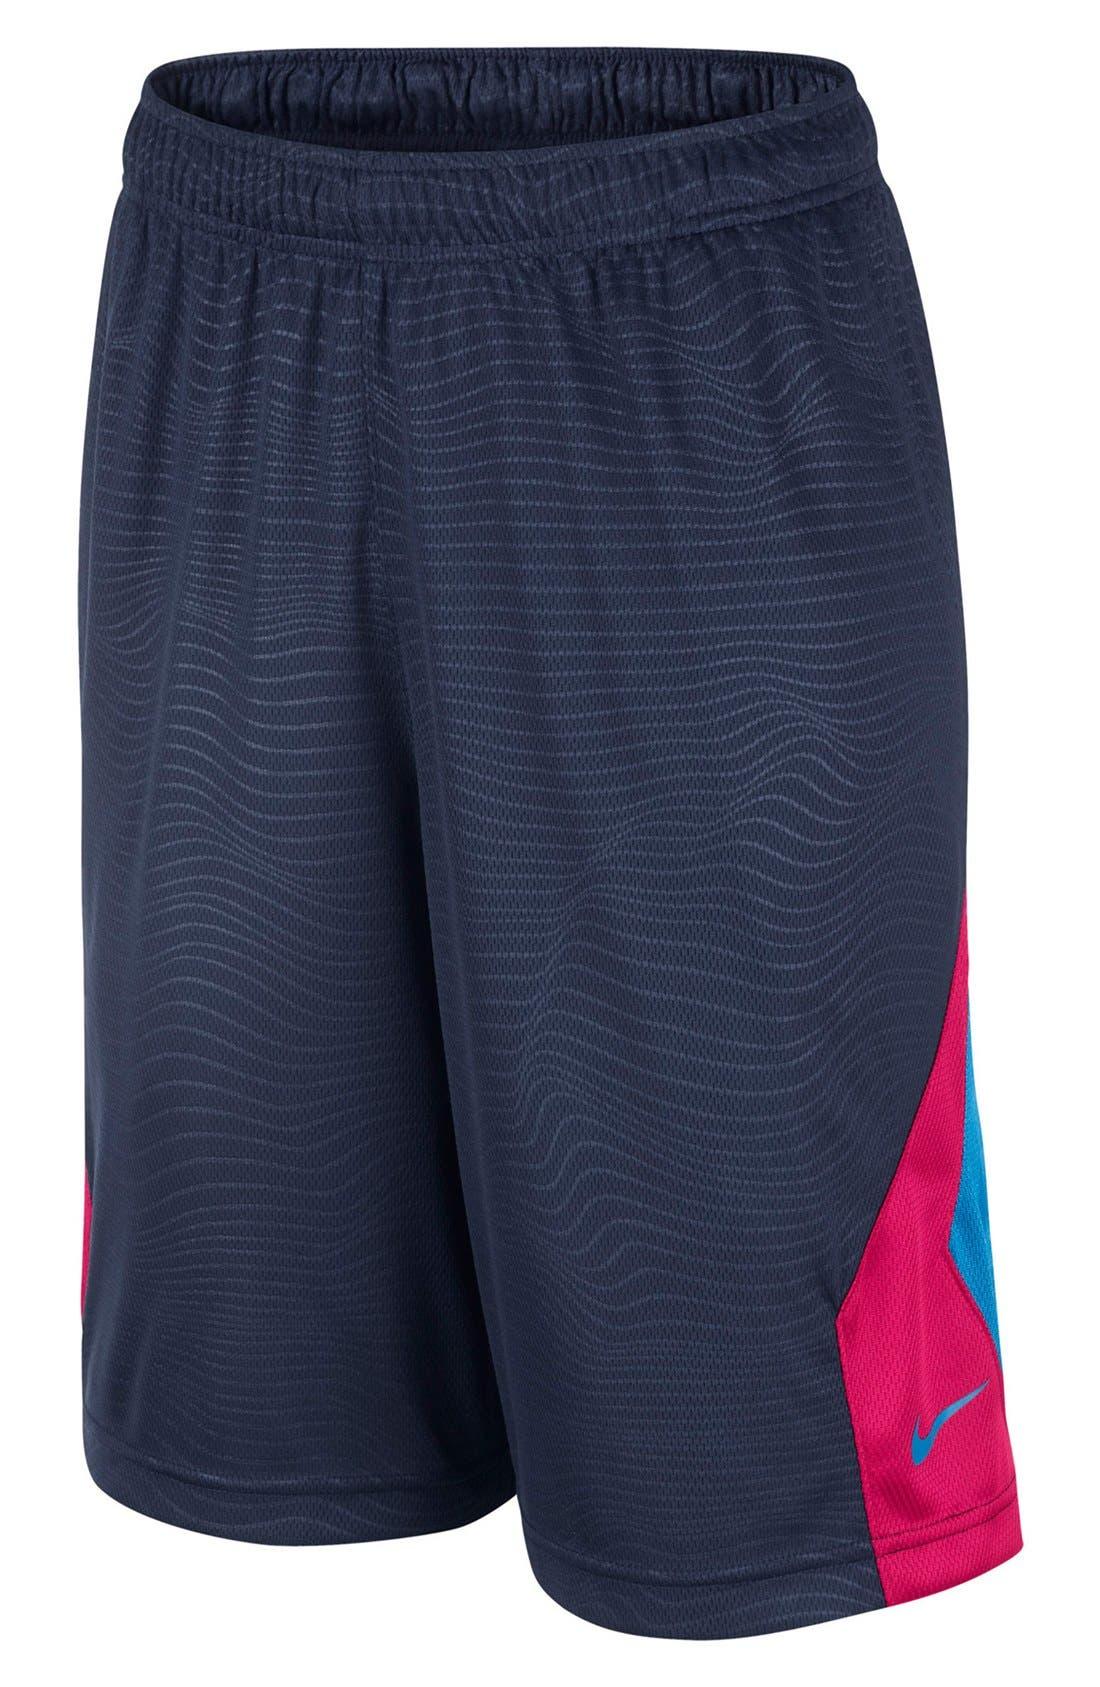 Alternate Image 1 Selected - Nike 'KD Essential' Dri-FIT Basketball Shorts (Big Boys)